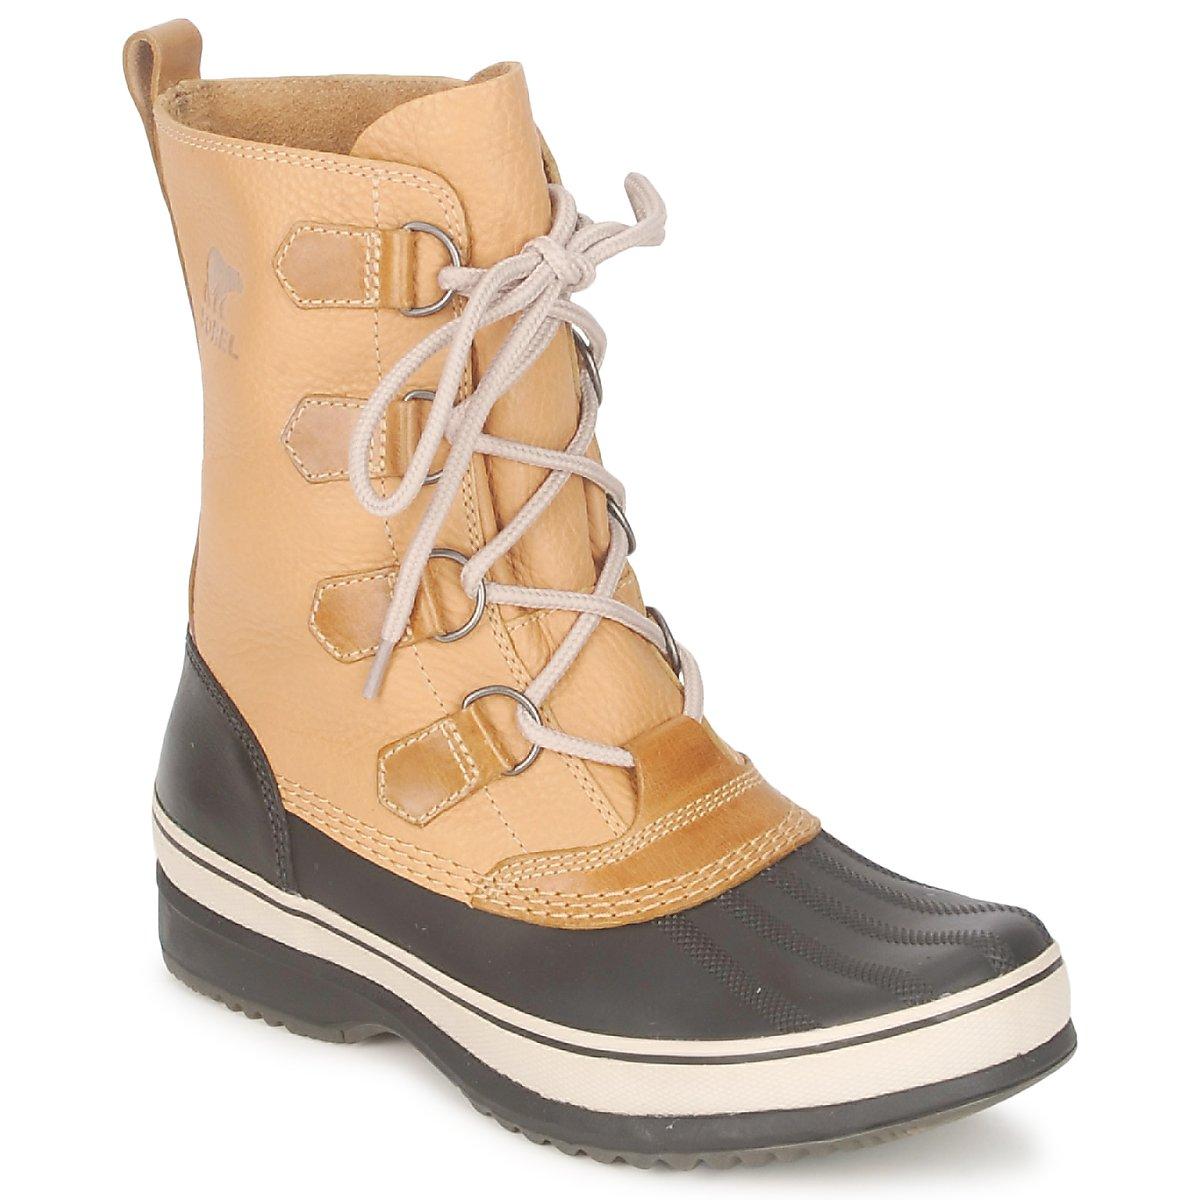 Zimni boty Sorel KITCHENER CARIBOU Žlutá kari